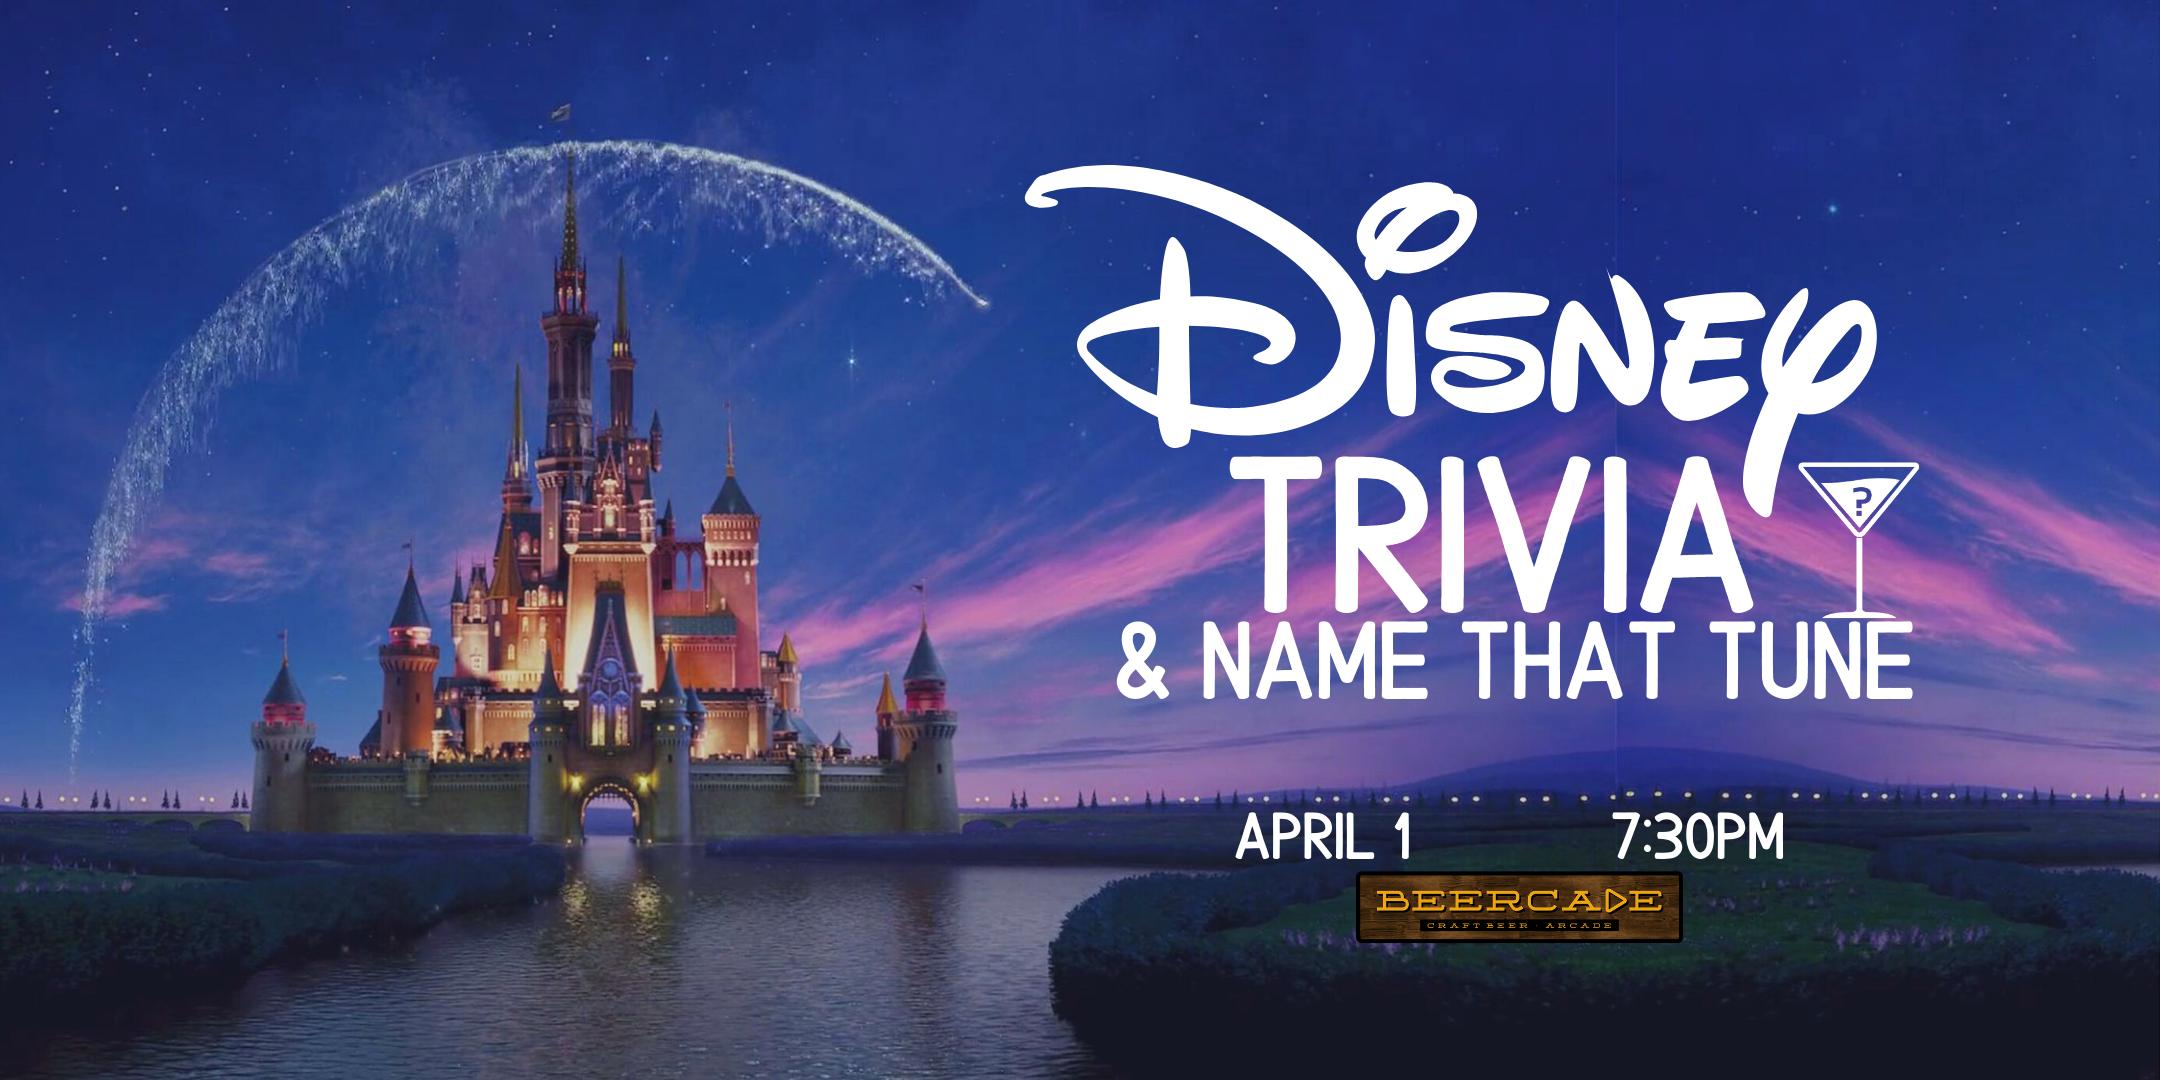 Disney Trivia & Name That Tune! - April 1, 7:30pm - Beercade